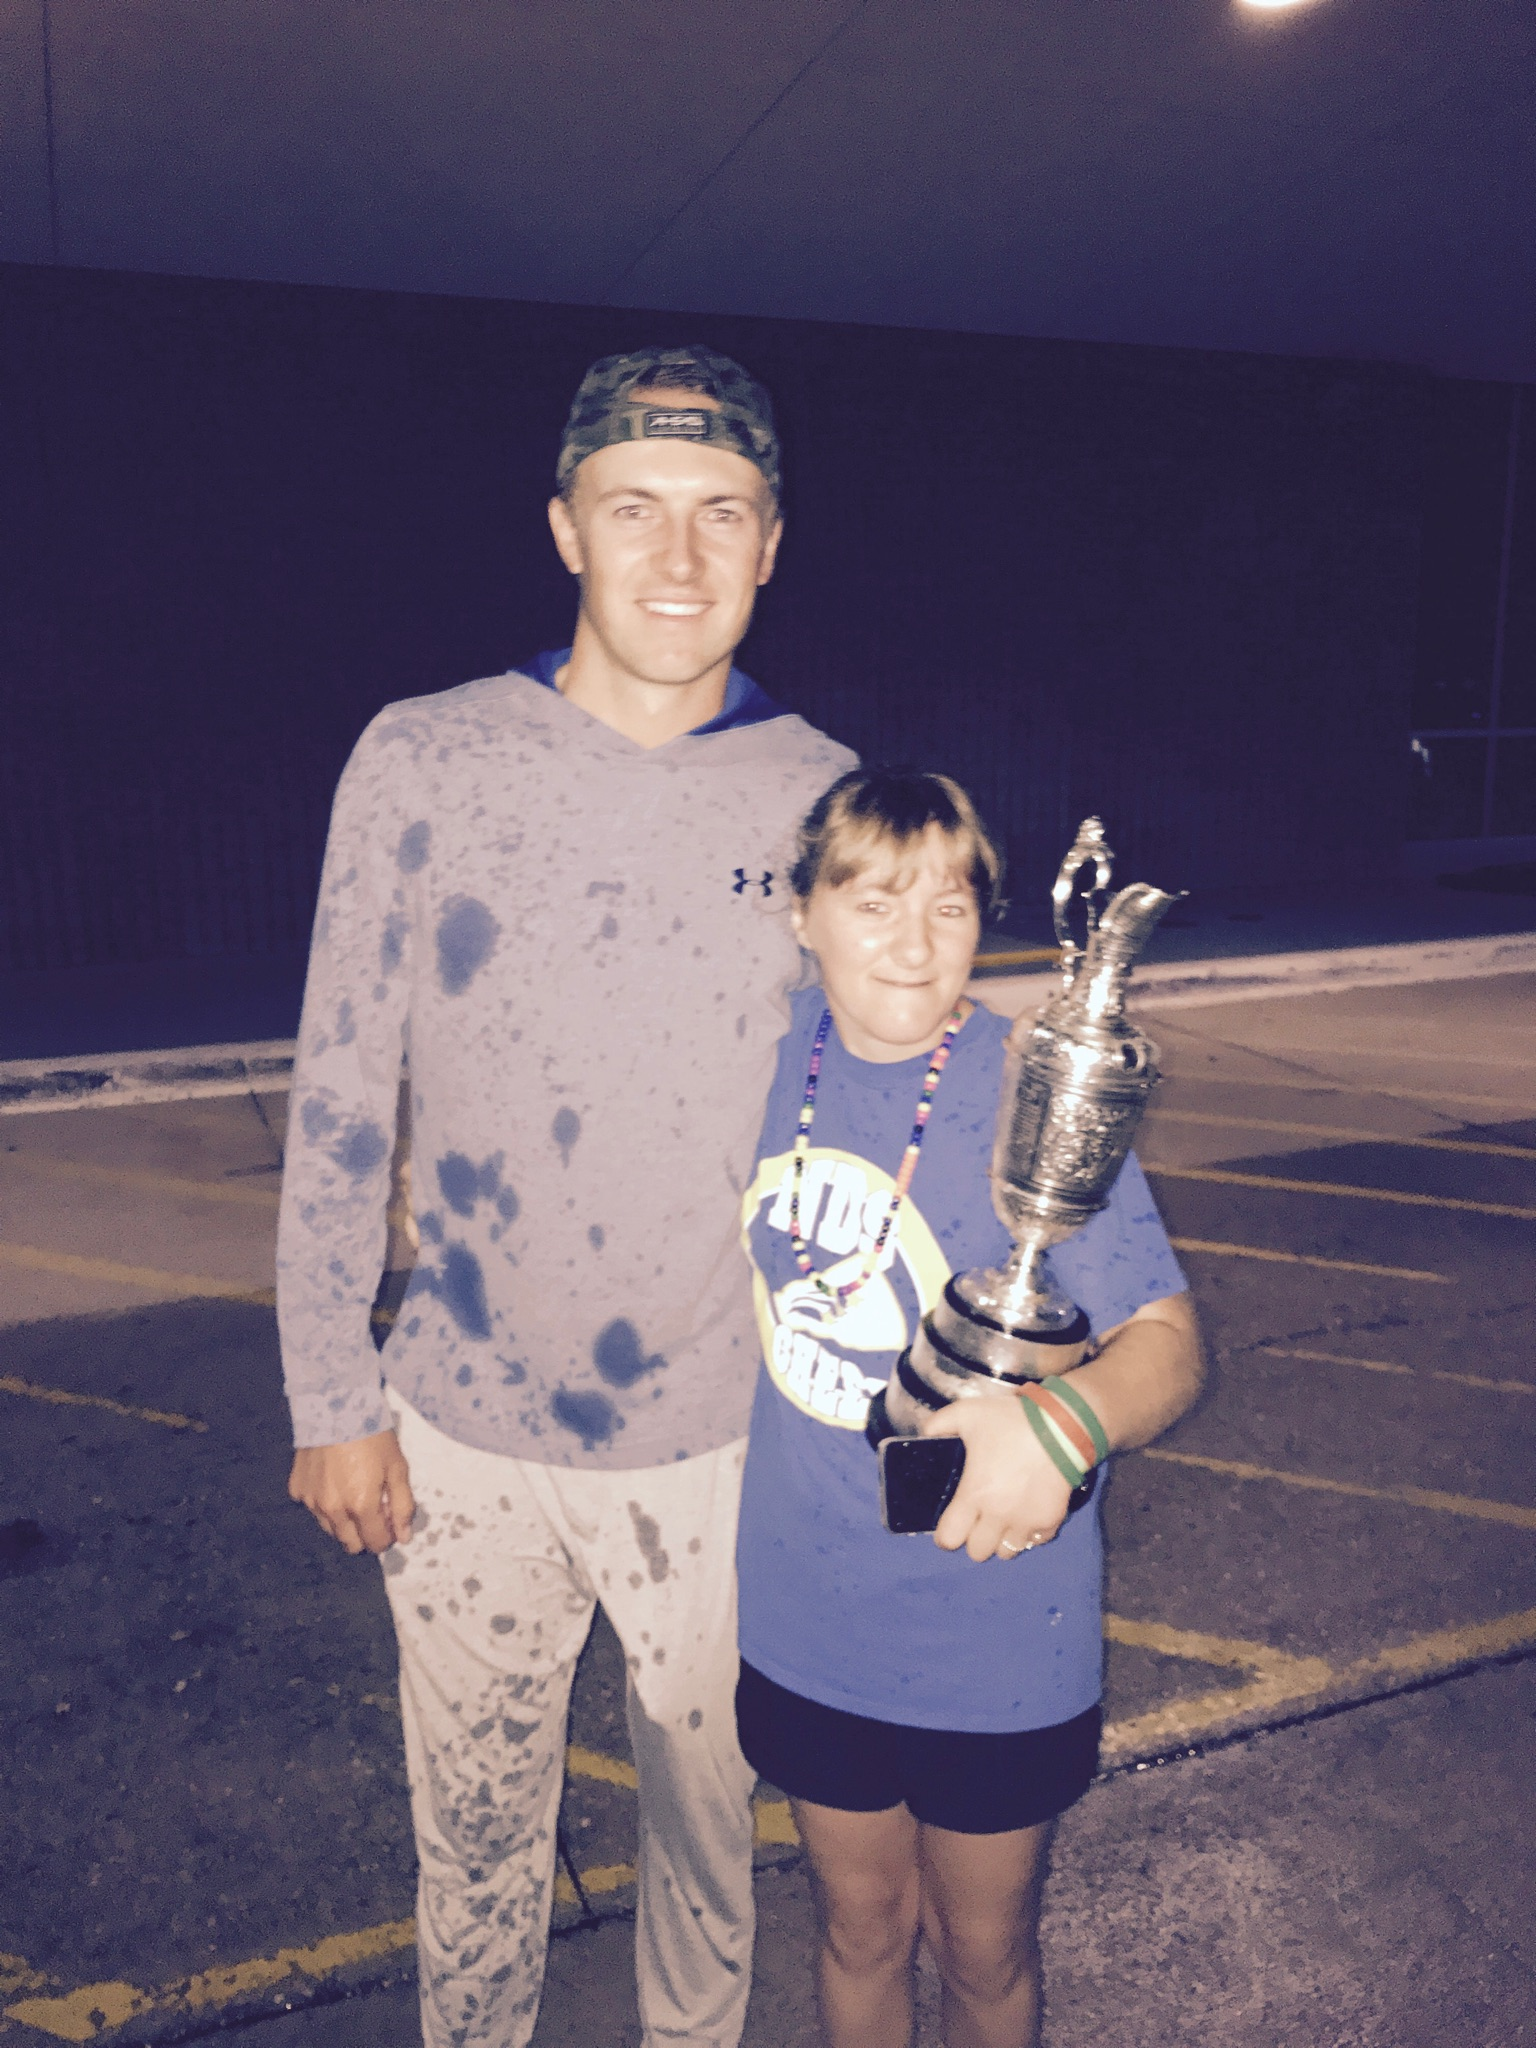 2017 Open Championship: Family Celebration - Jordan and Ellie